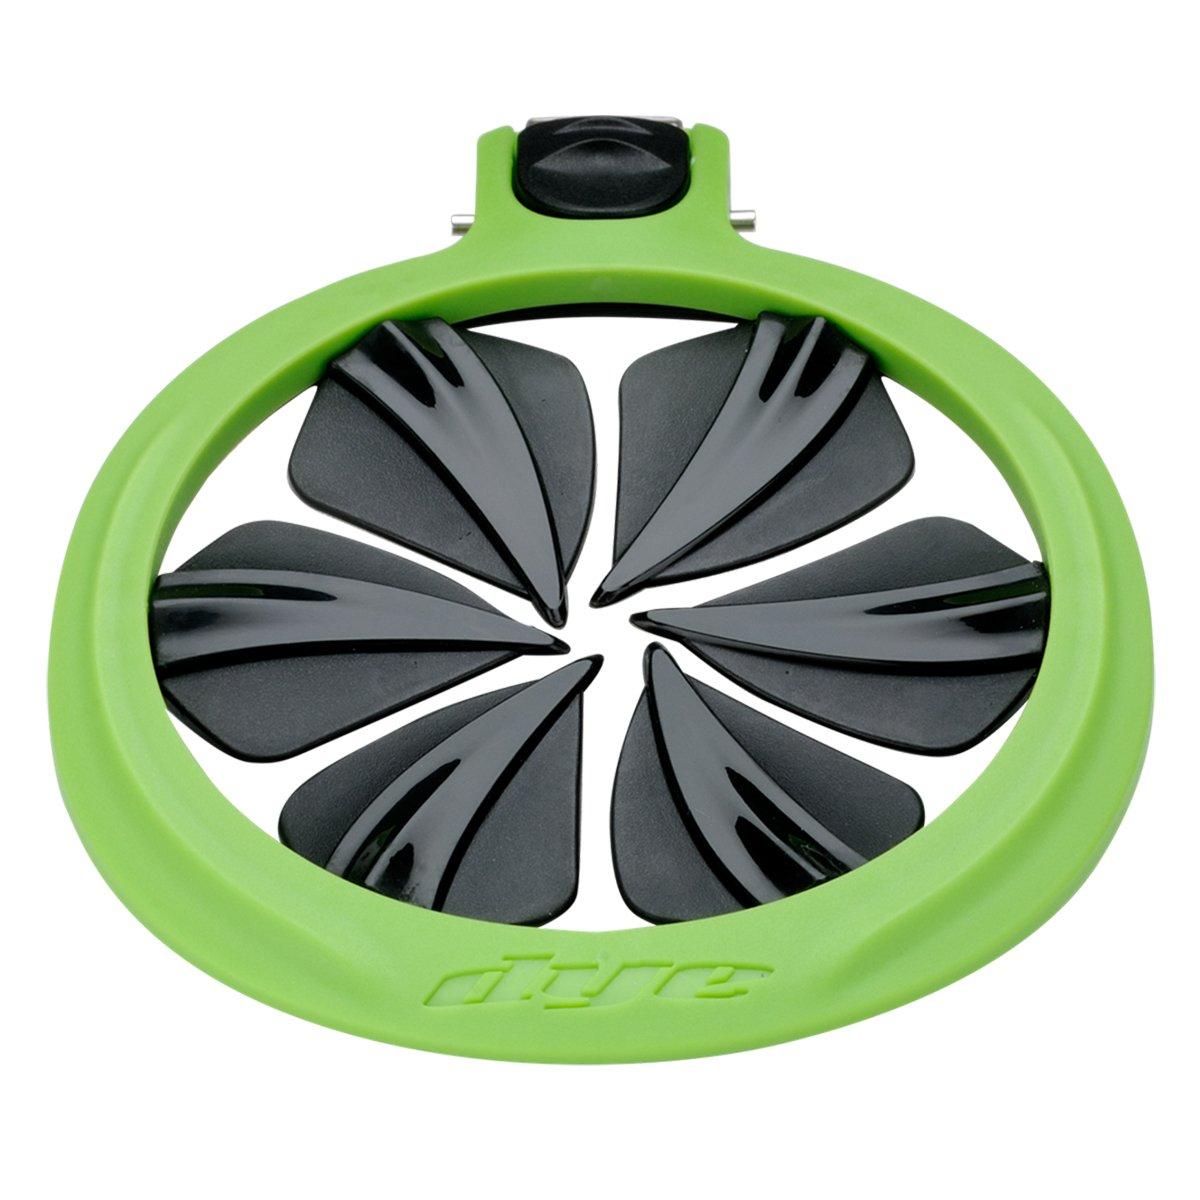 Dye R2 Quickfeed Rotor - Bright Green by Dye